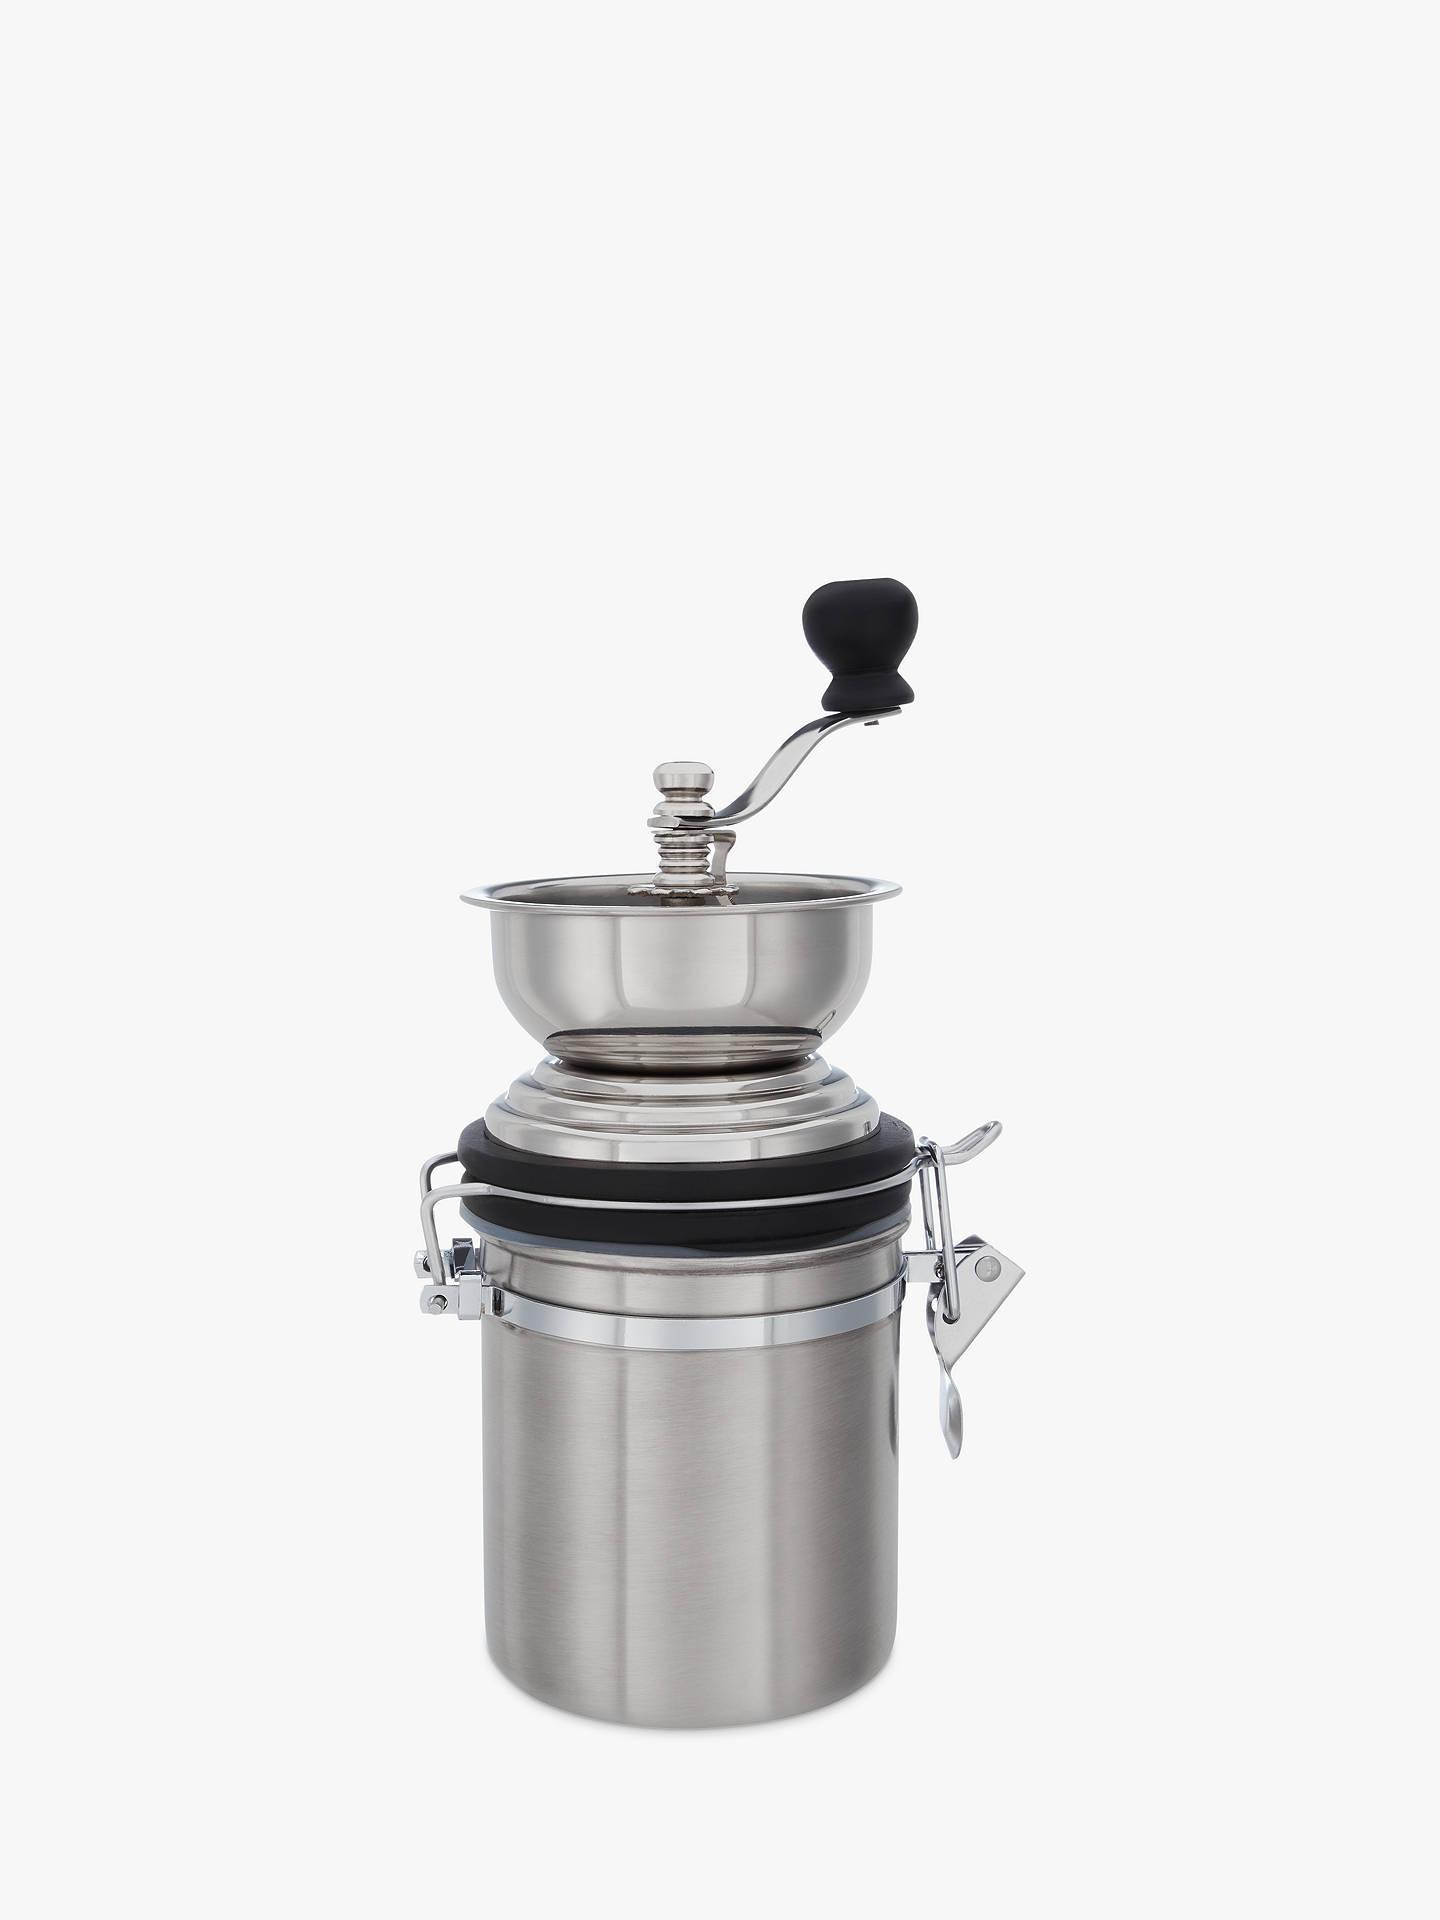 8c9b524b0 Buy LEON Stainless Steel Coffee Grinder Online at johnlewis.com ...